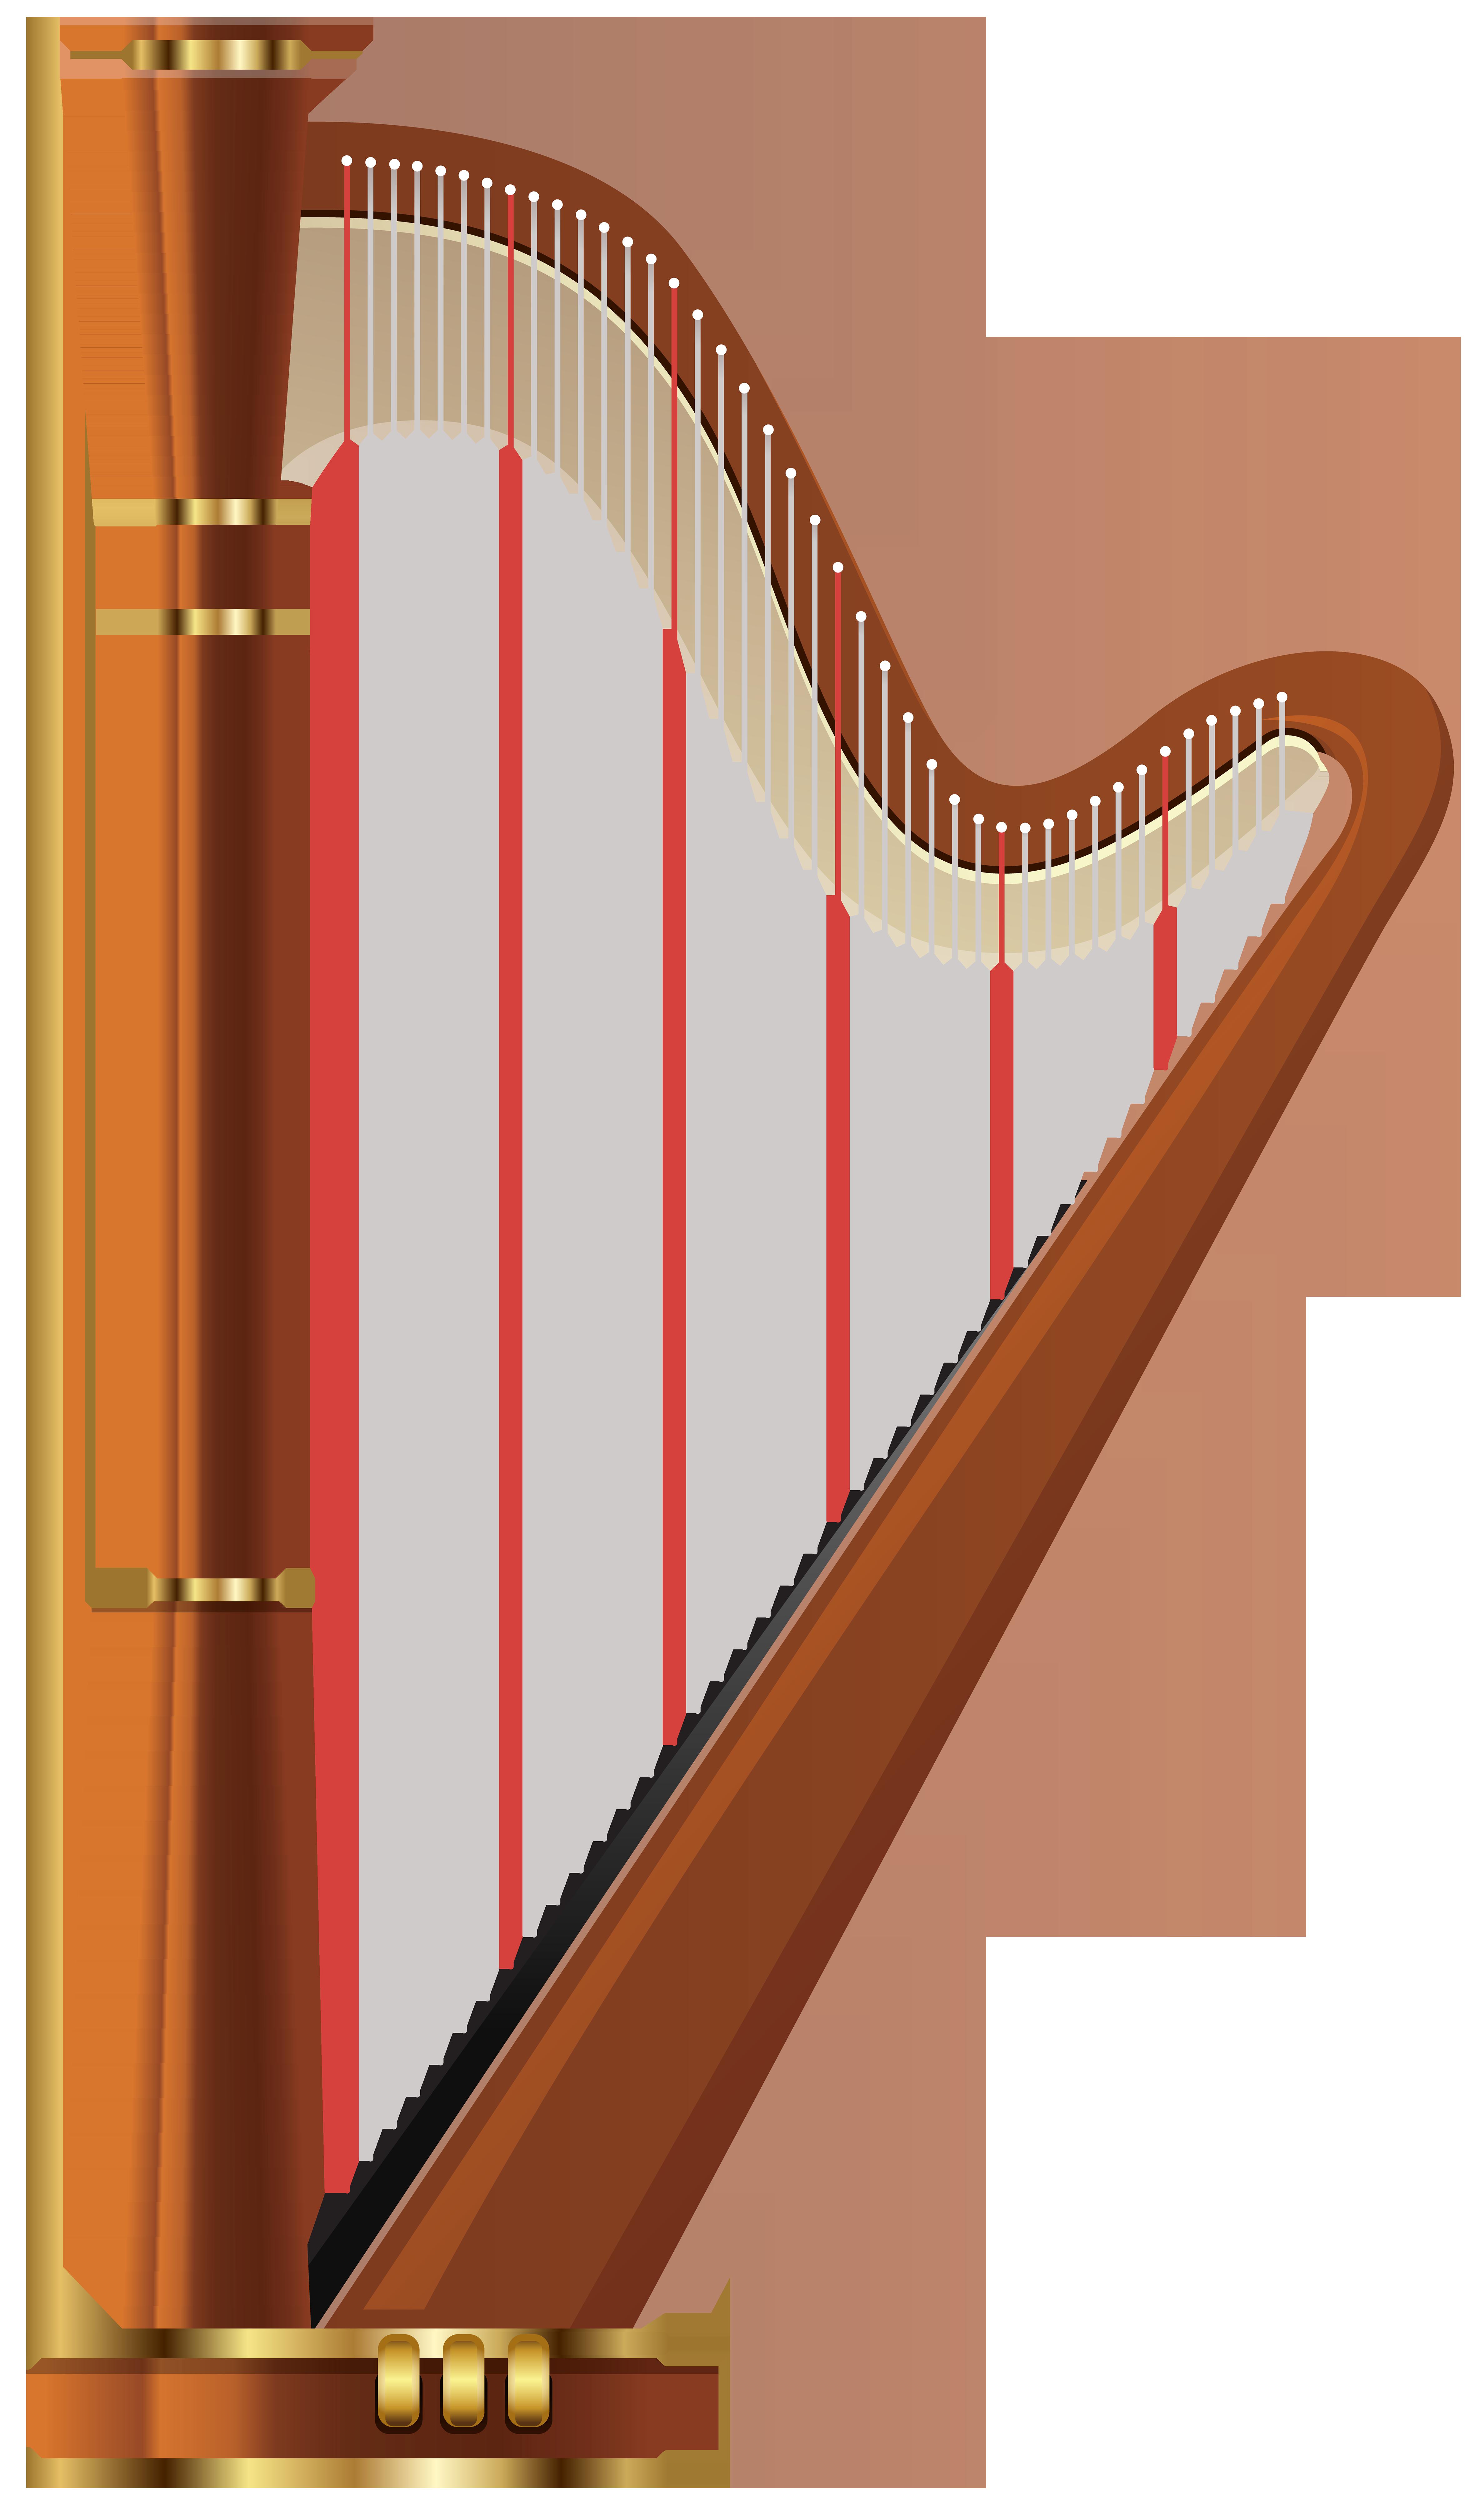 clipart royalty free Transparent png clip art. Harp clipart.